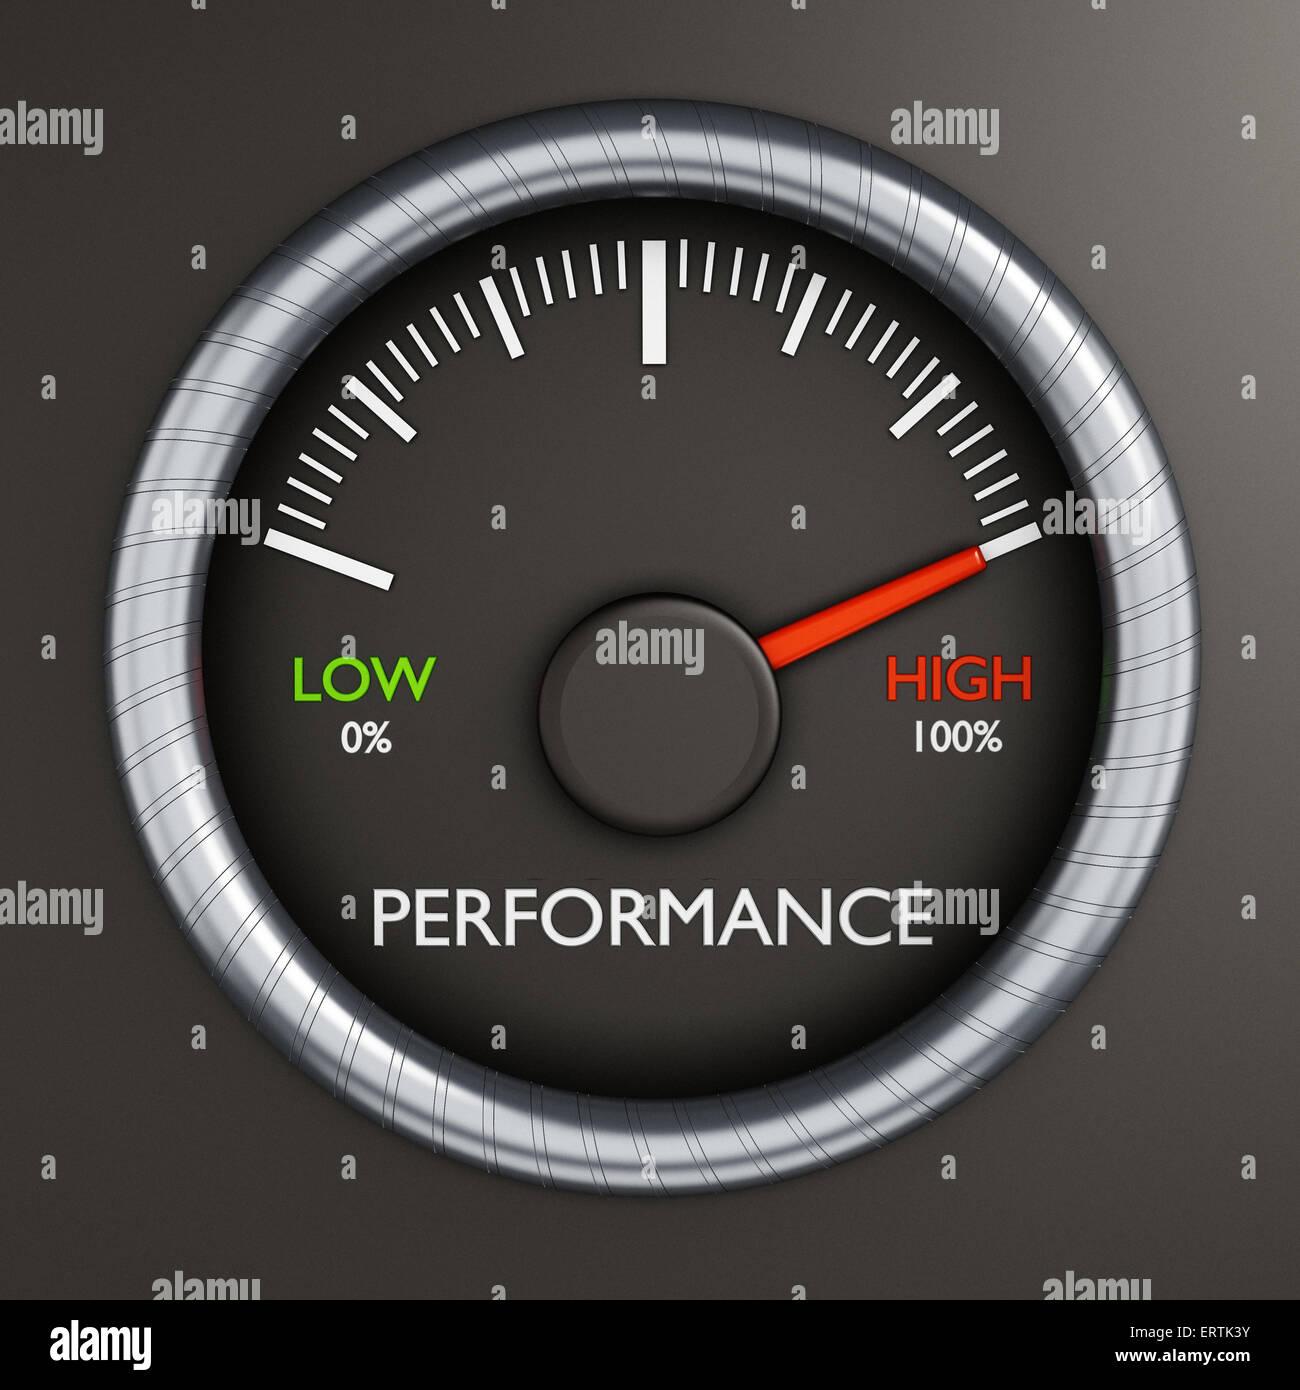 Performance meter indicates high performance - Stock Image